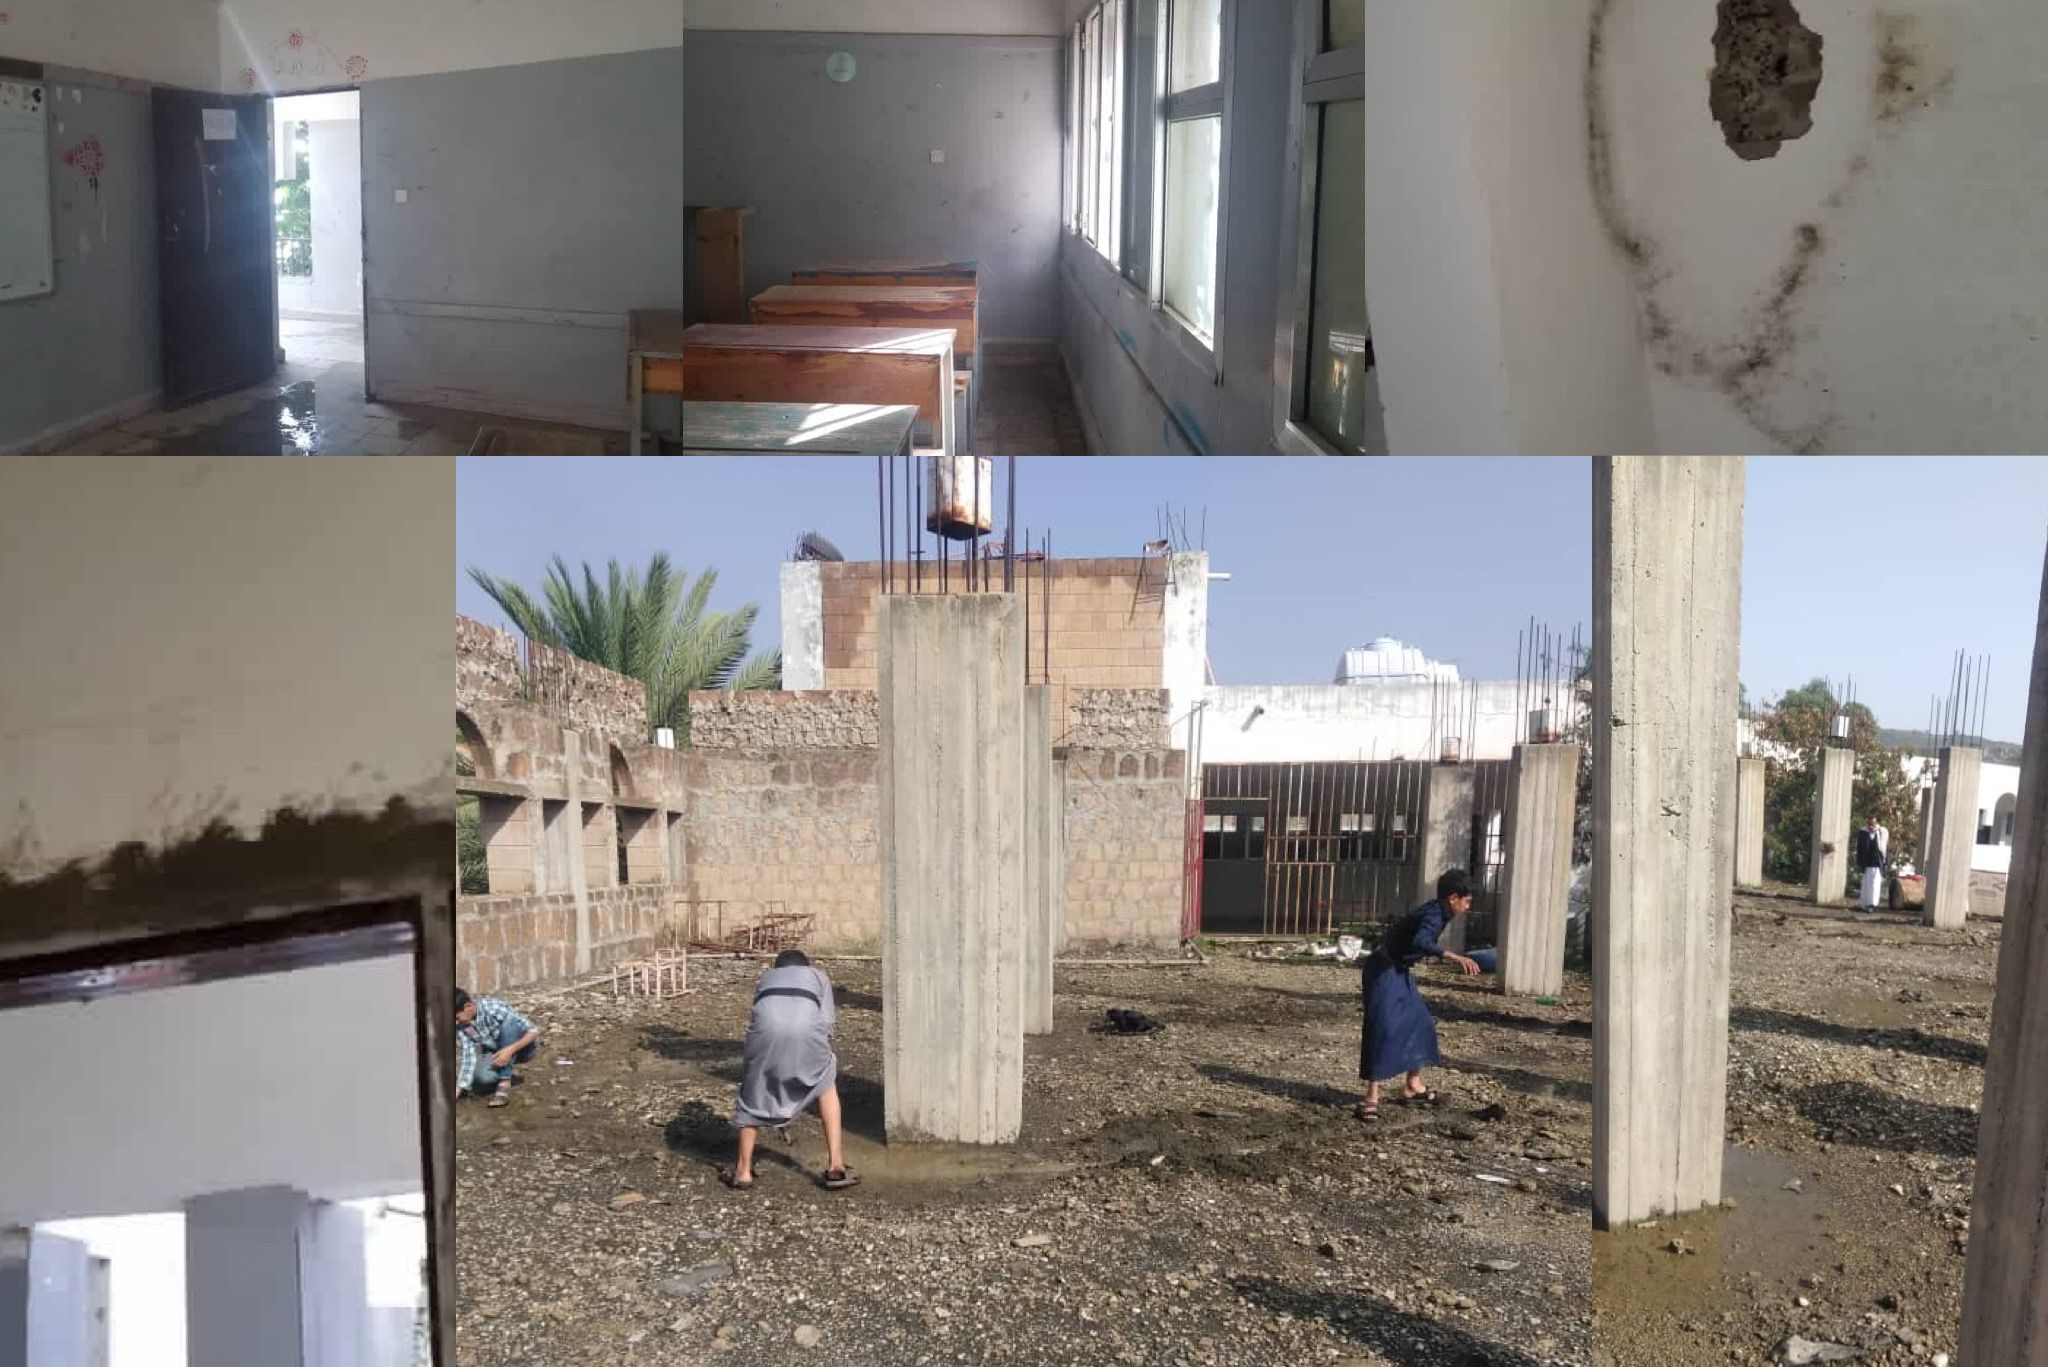 #LFT Yemen – Zaid al Mushaki School in Al-Sabeen District of Sanaa Yemen 🇾🇪